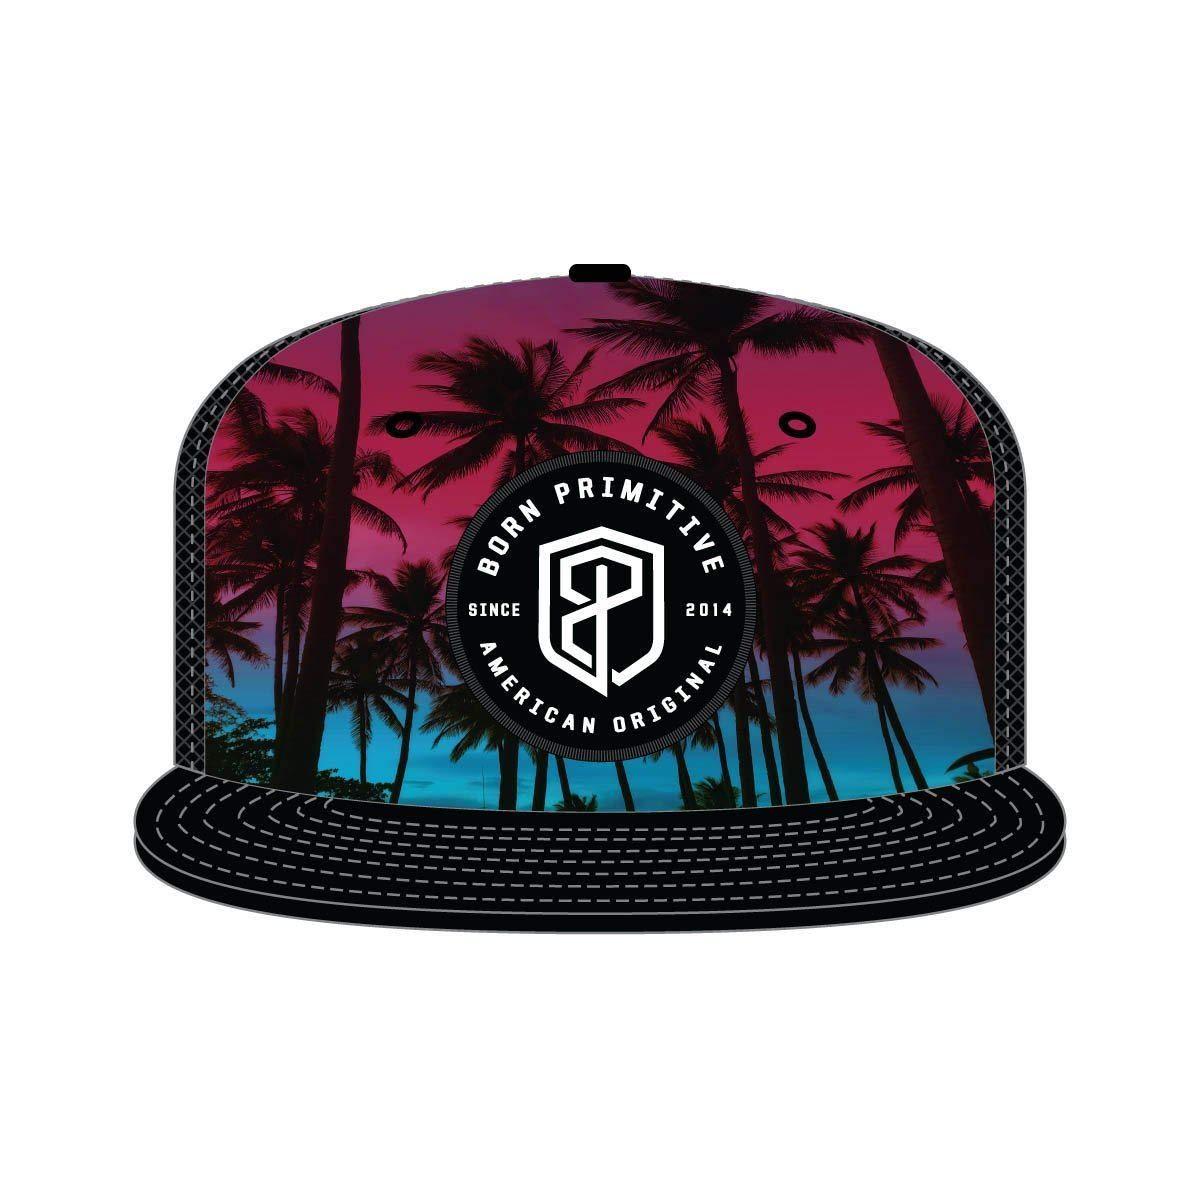 American Original Snapback Hat Midnight Palm